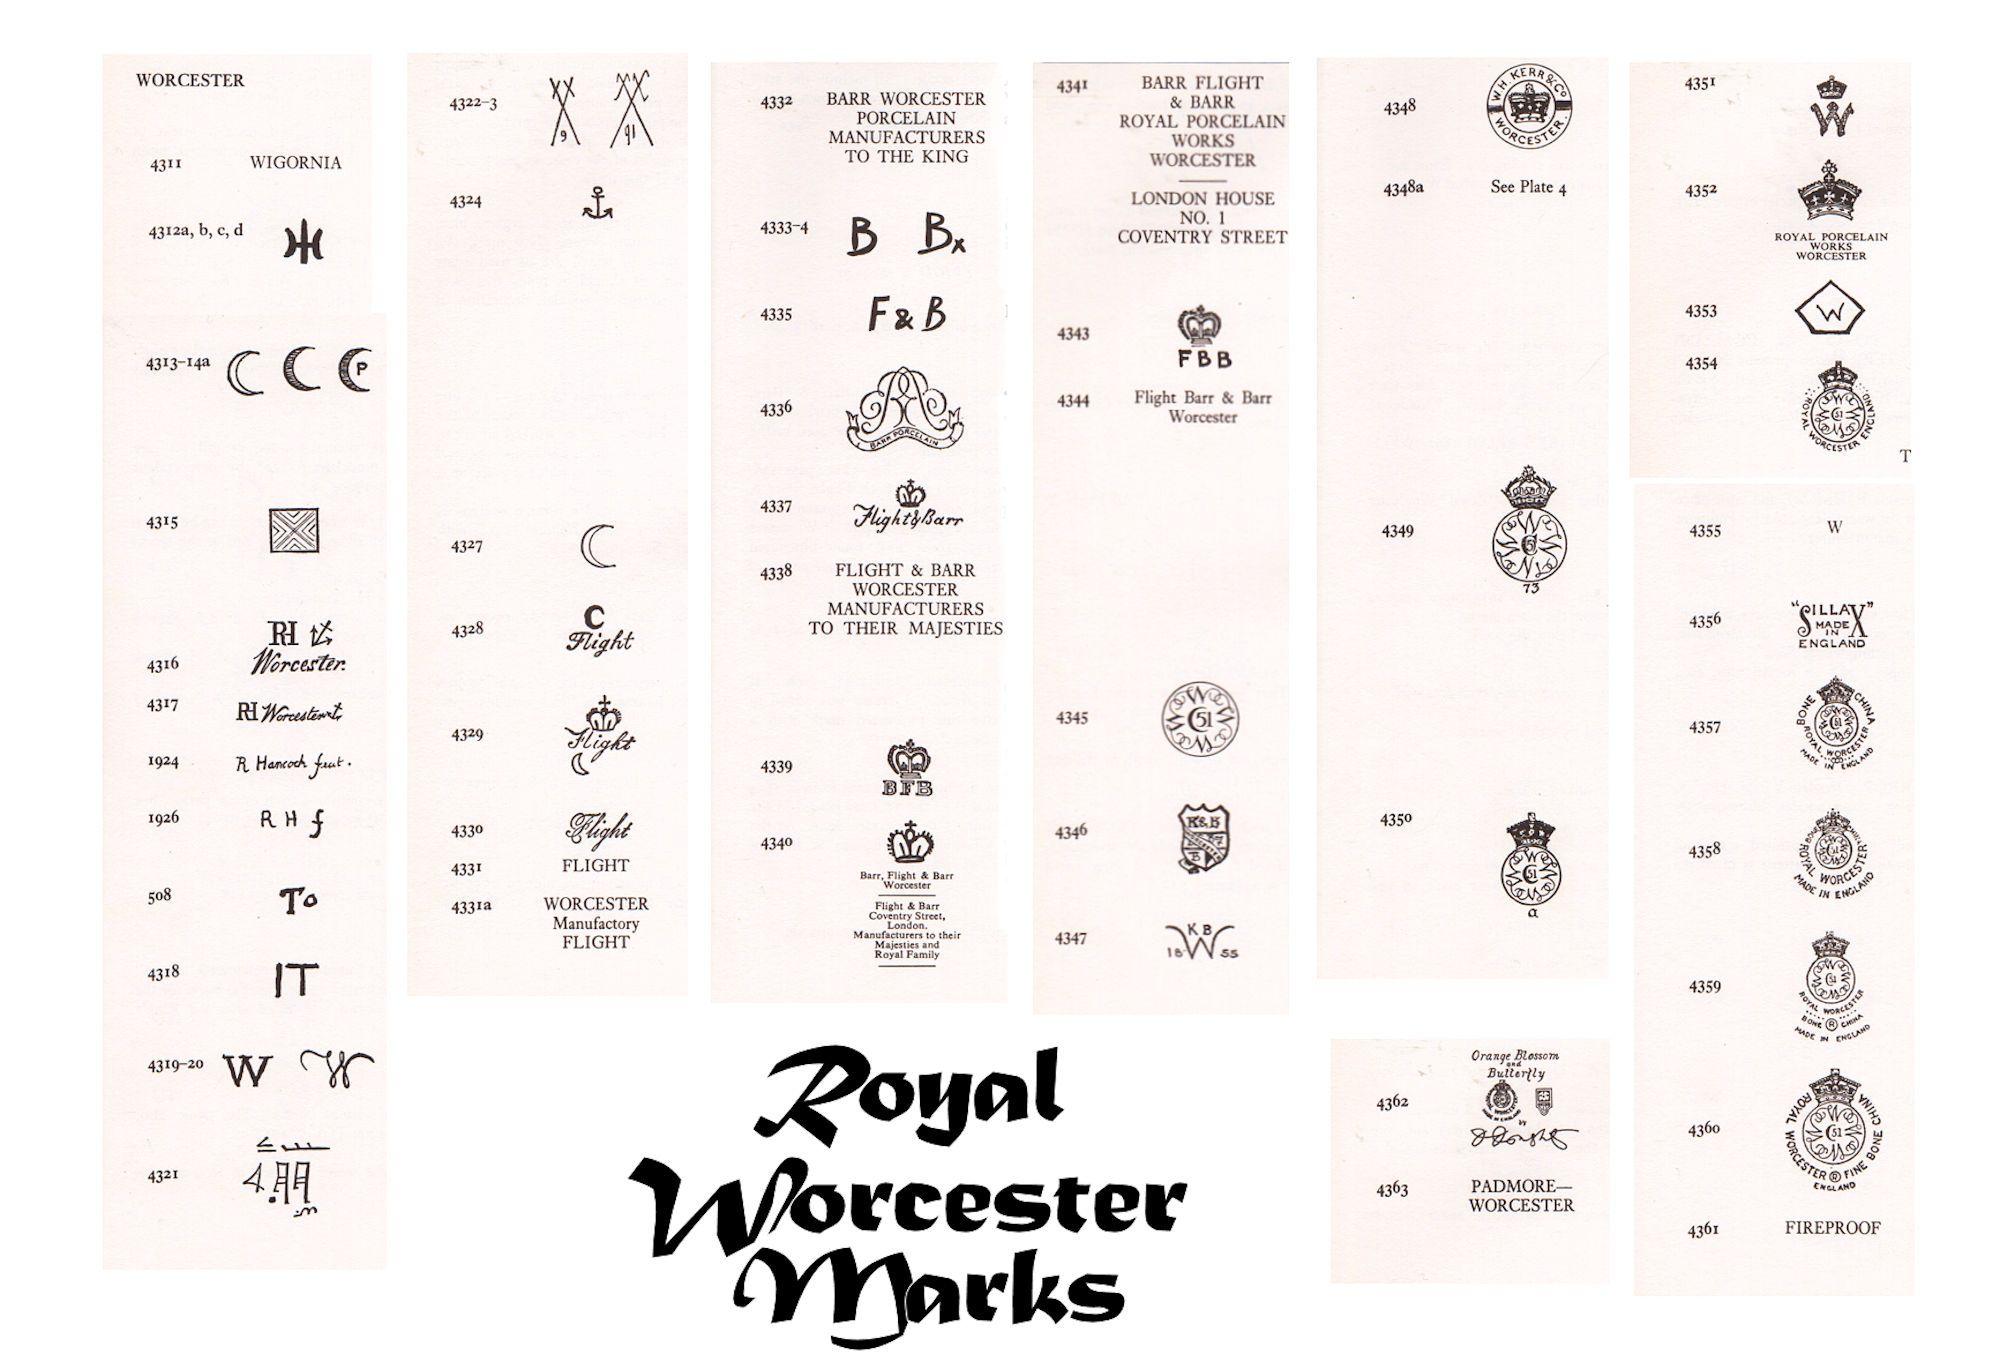 royal worcester dating